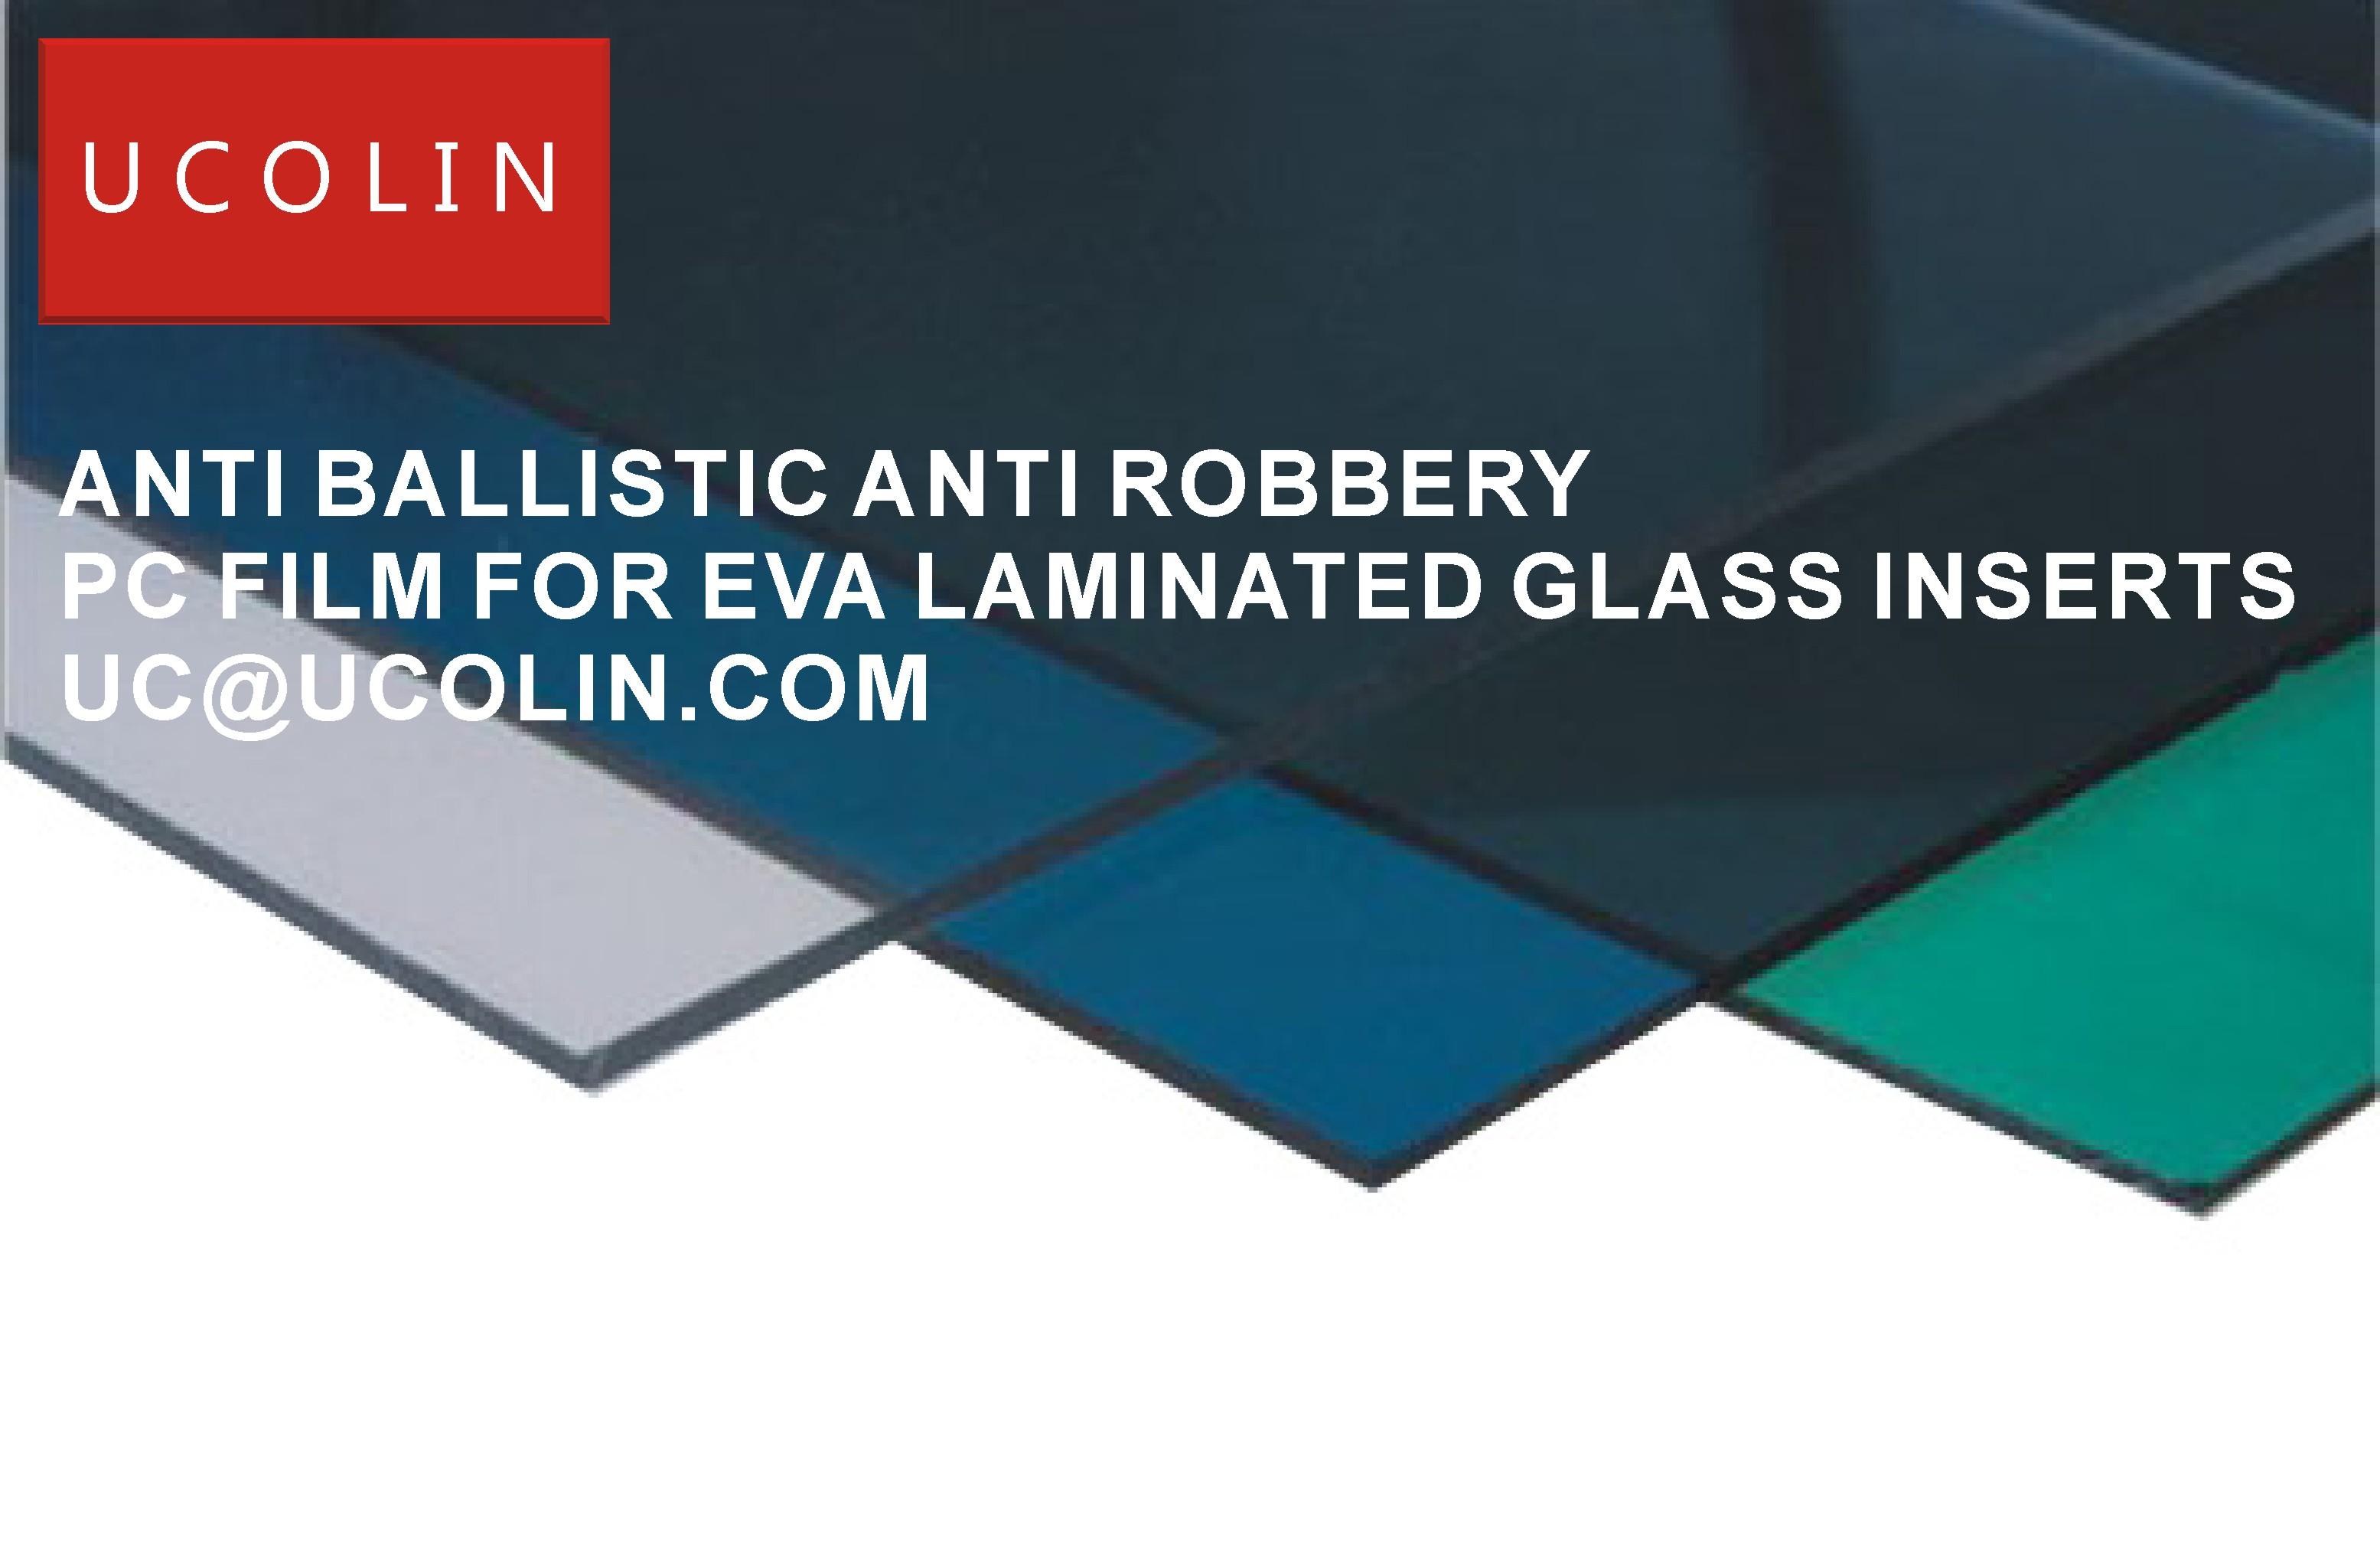 05 ANTI BALLISTIC ANTI ROBBERY PC FILM FOR EVA LAMINATED GLASS INERTS